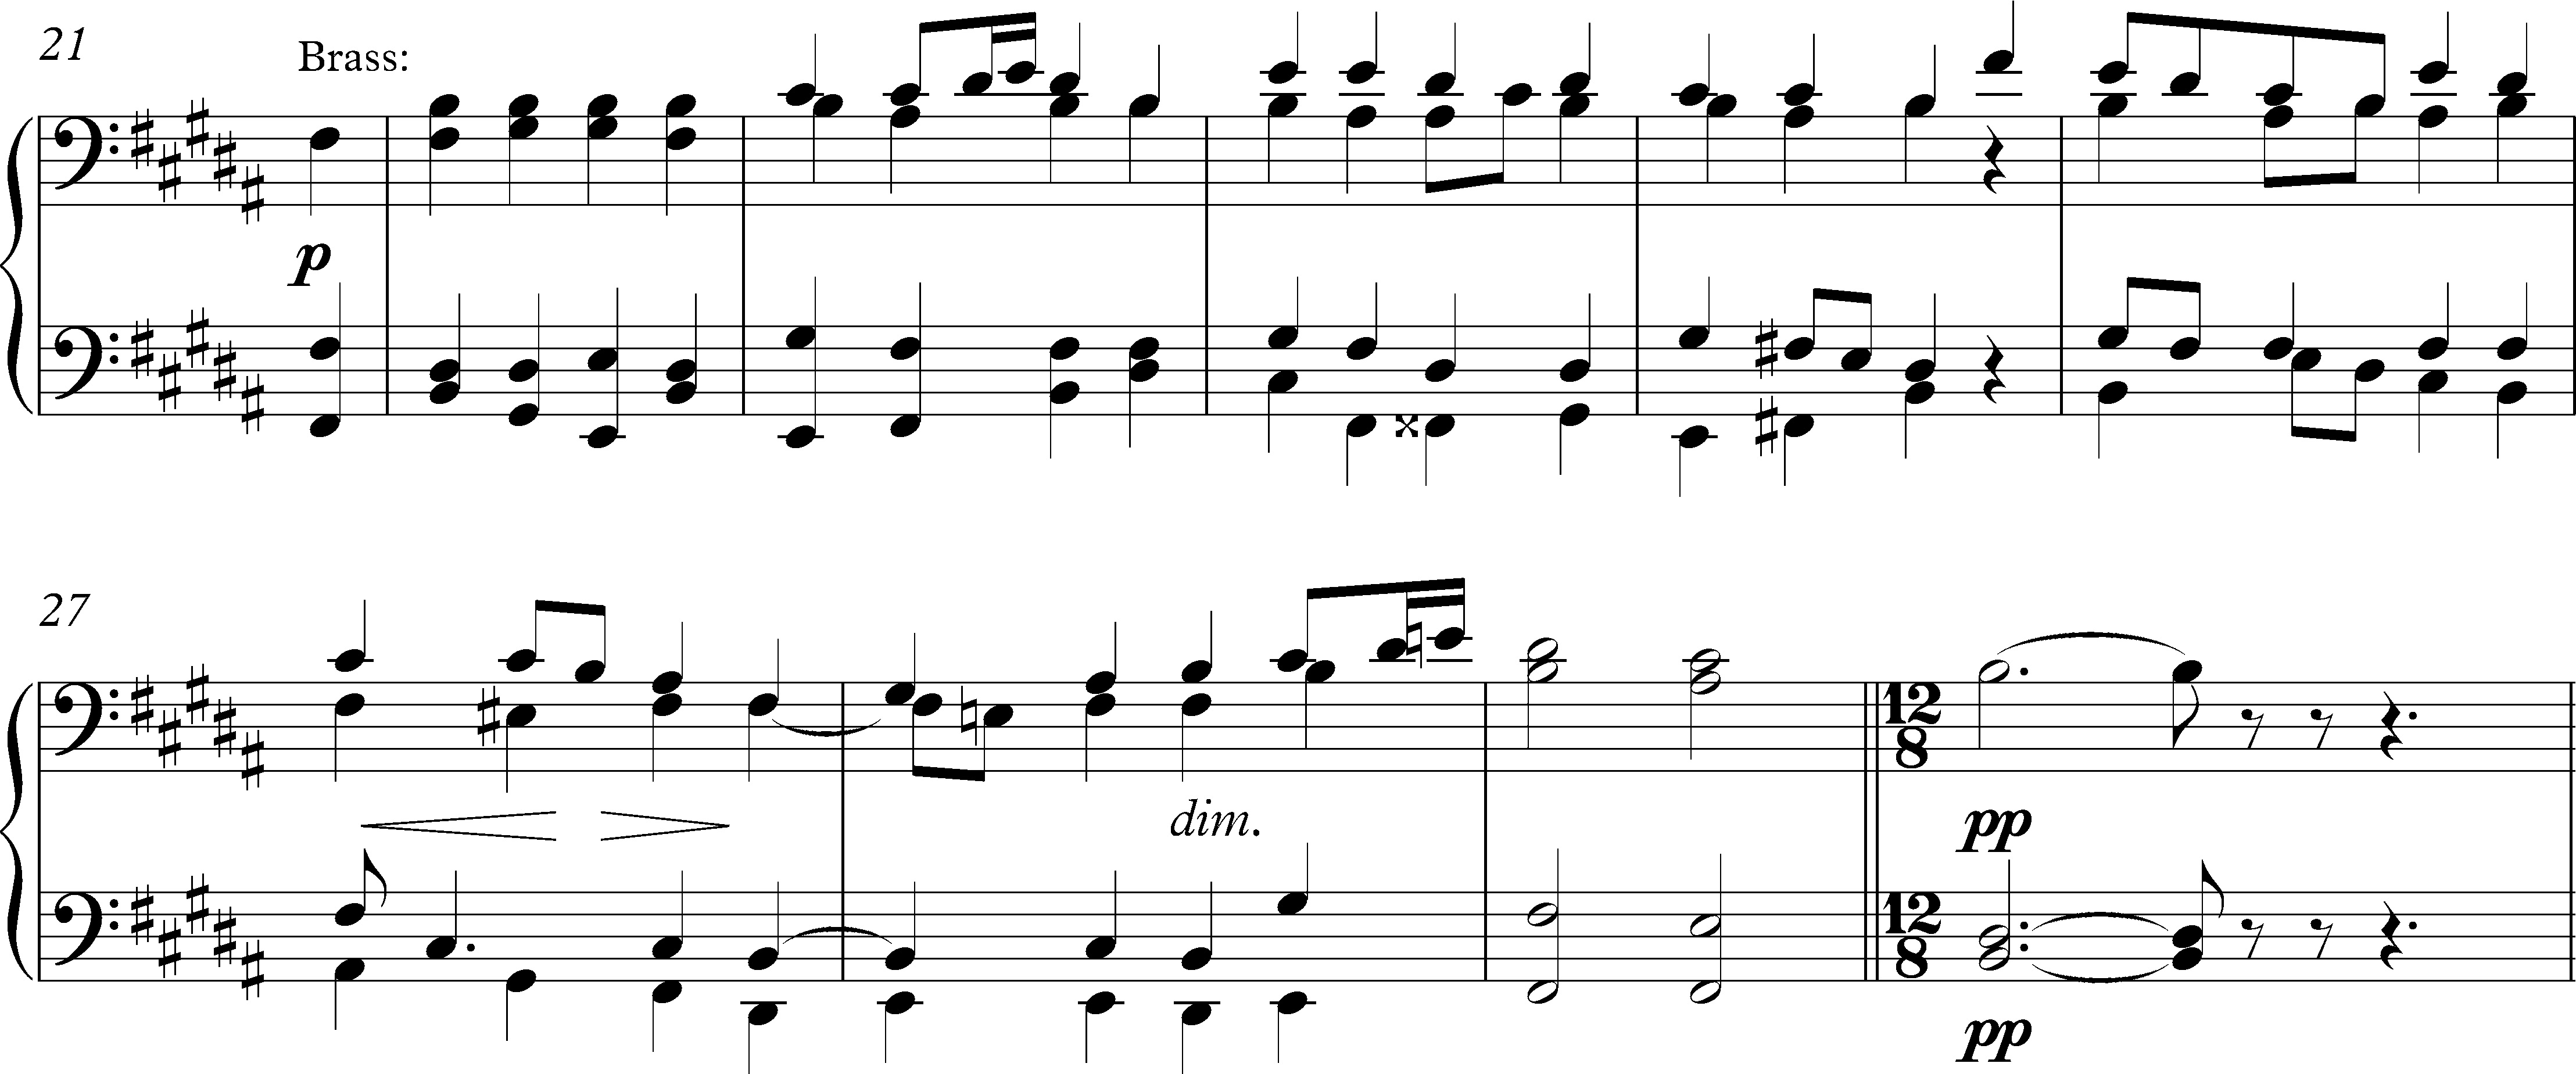 https://www.kylegann.com/Bristow4ii-Chorale.jpg